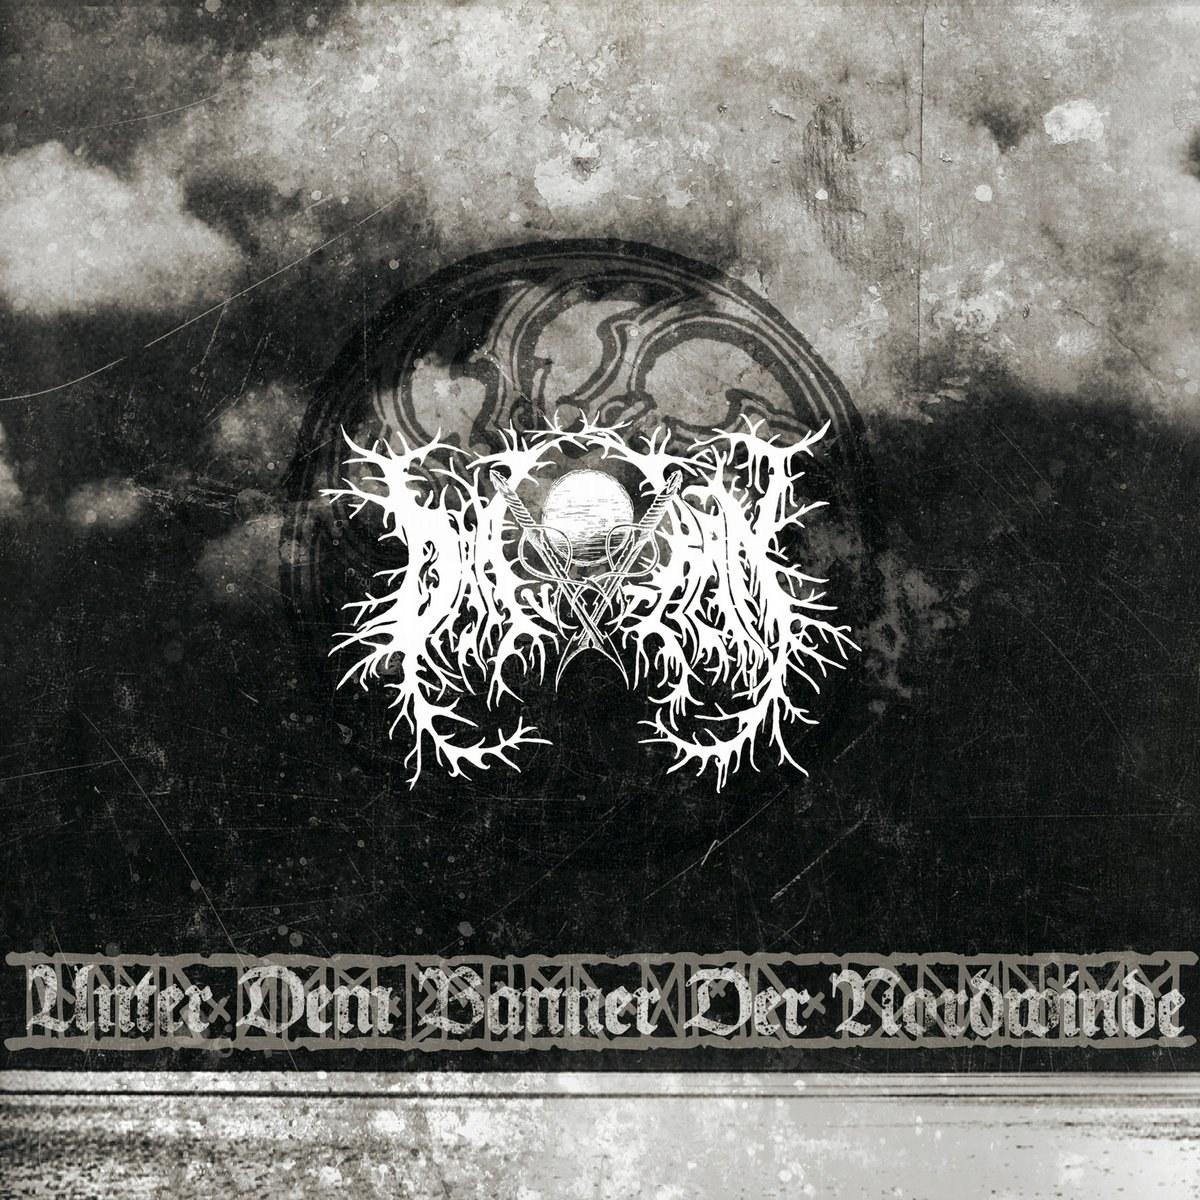 Review for Drautran - Unter dem Banner der Nordwinde